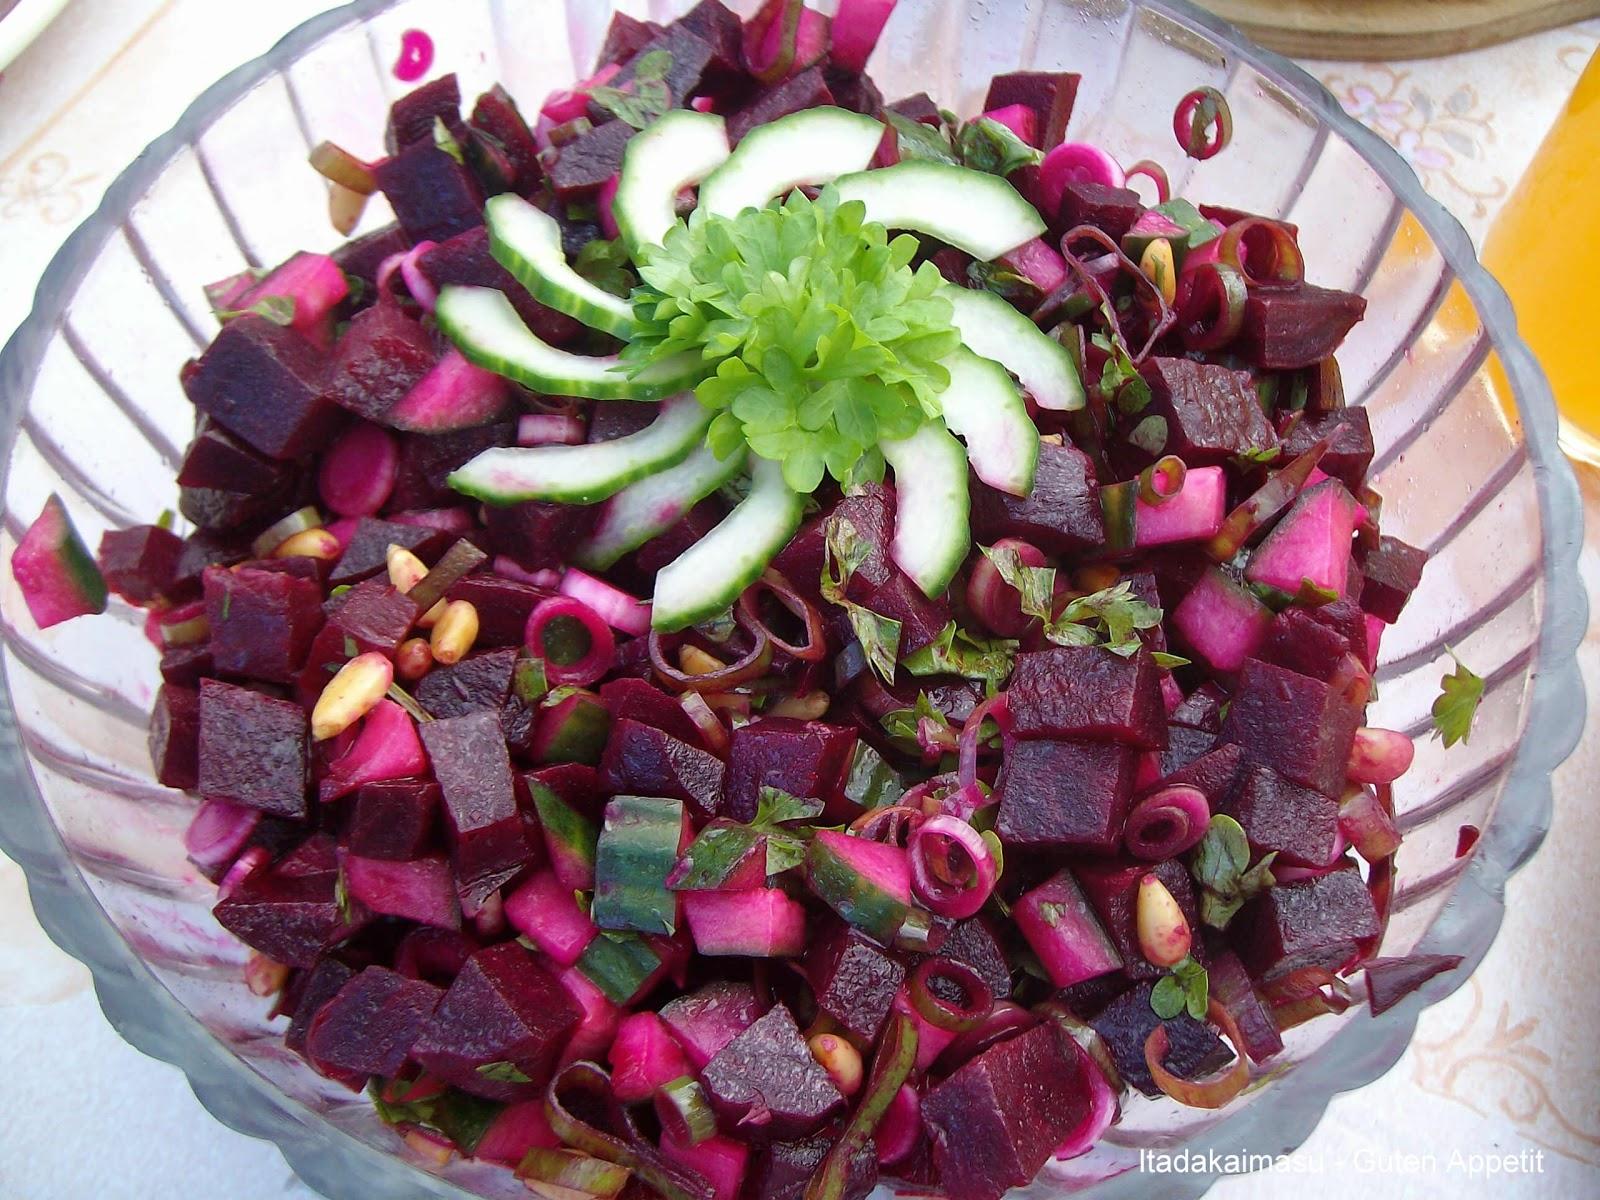 itadakimasu guten appetit rote bete salat. Black Bedroom Furniture Sets. Home Design Ideas